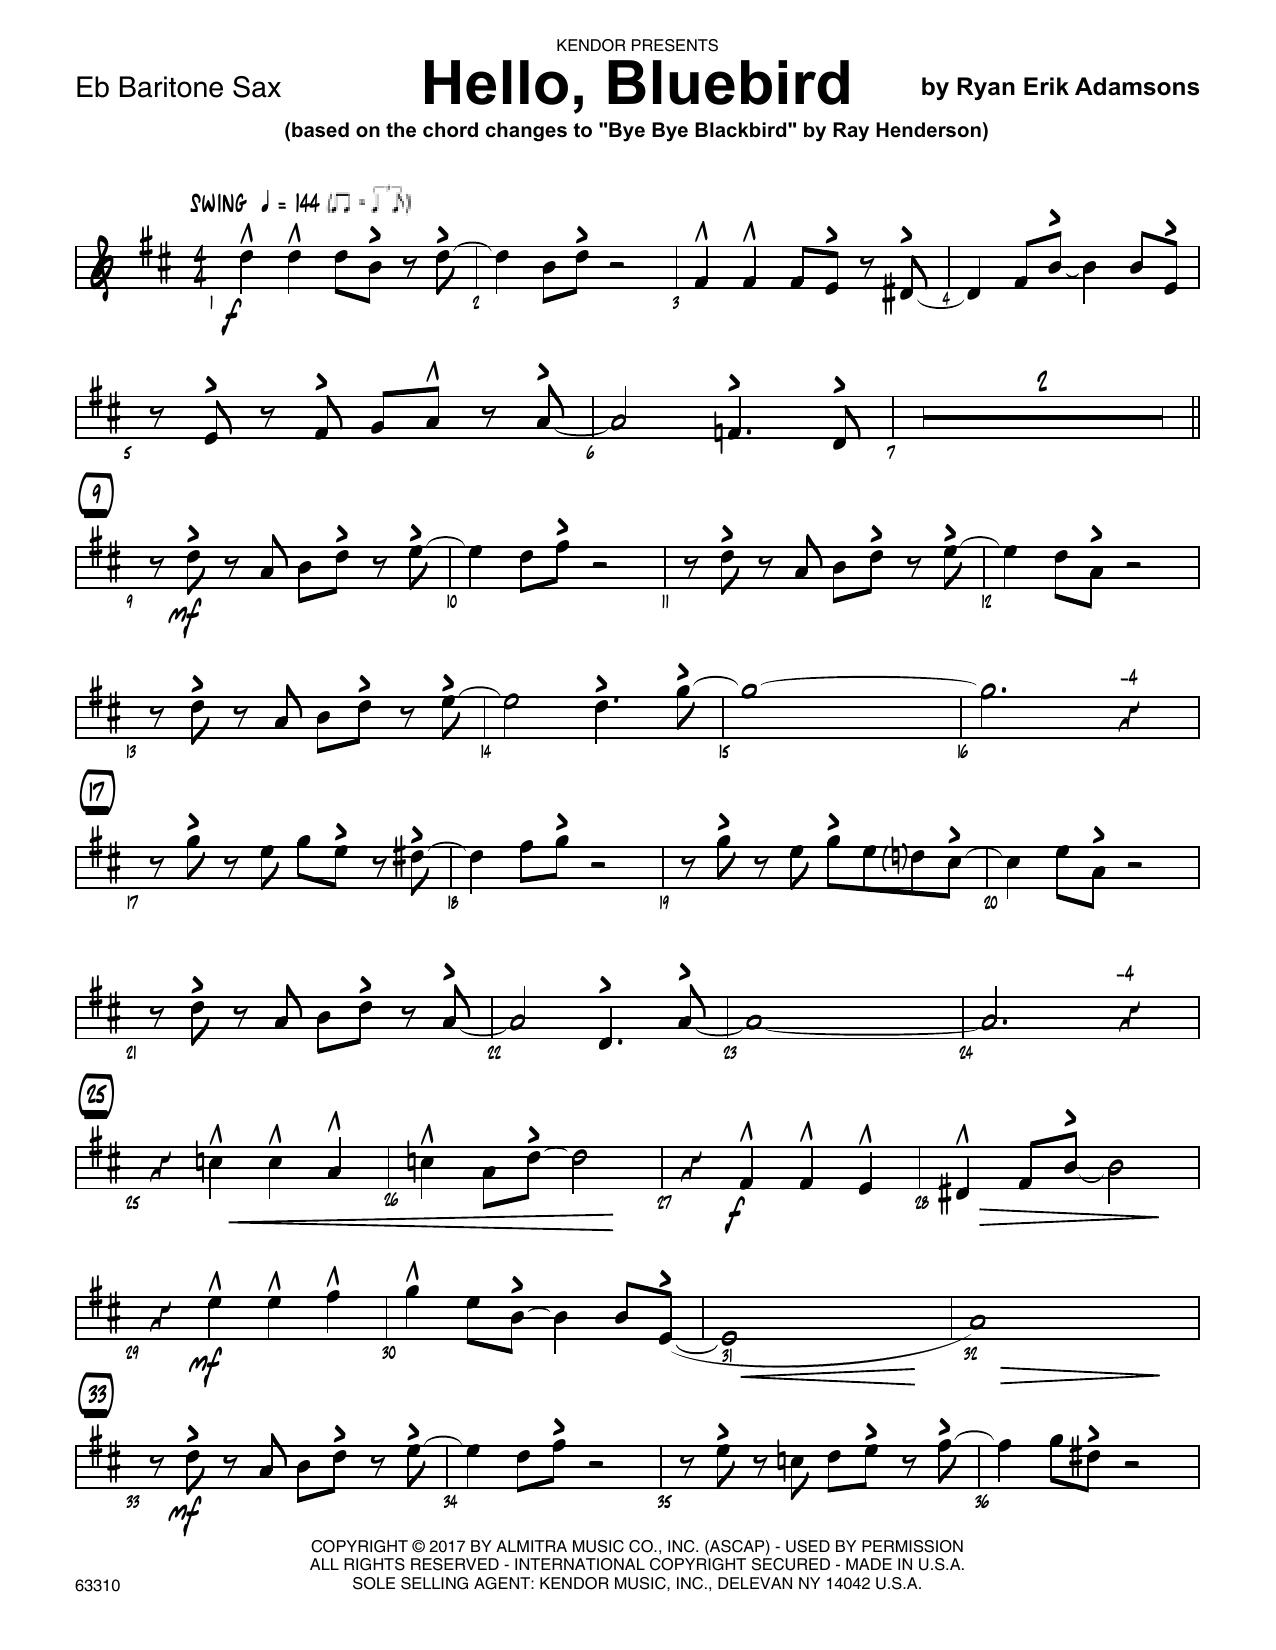 Ryan Erik Adamsons Hello, Bluebird (based on Bye Bye Blackbird) - Eb Baritone Saxophone sheet music notes printable PDF score